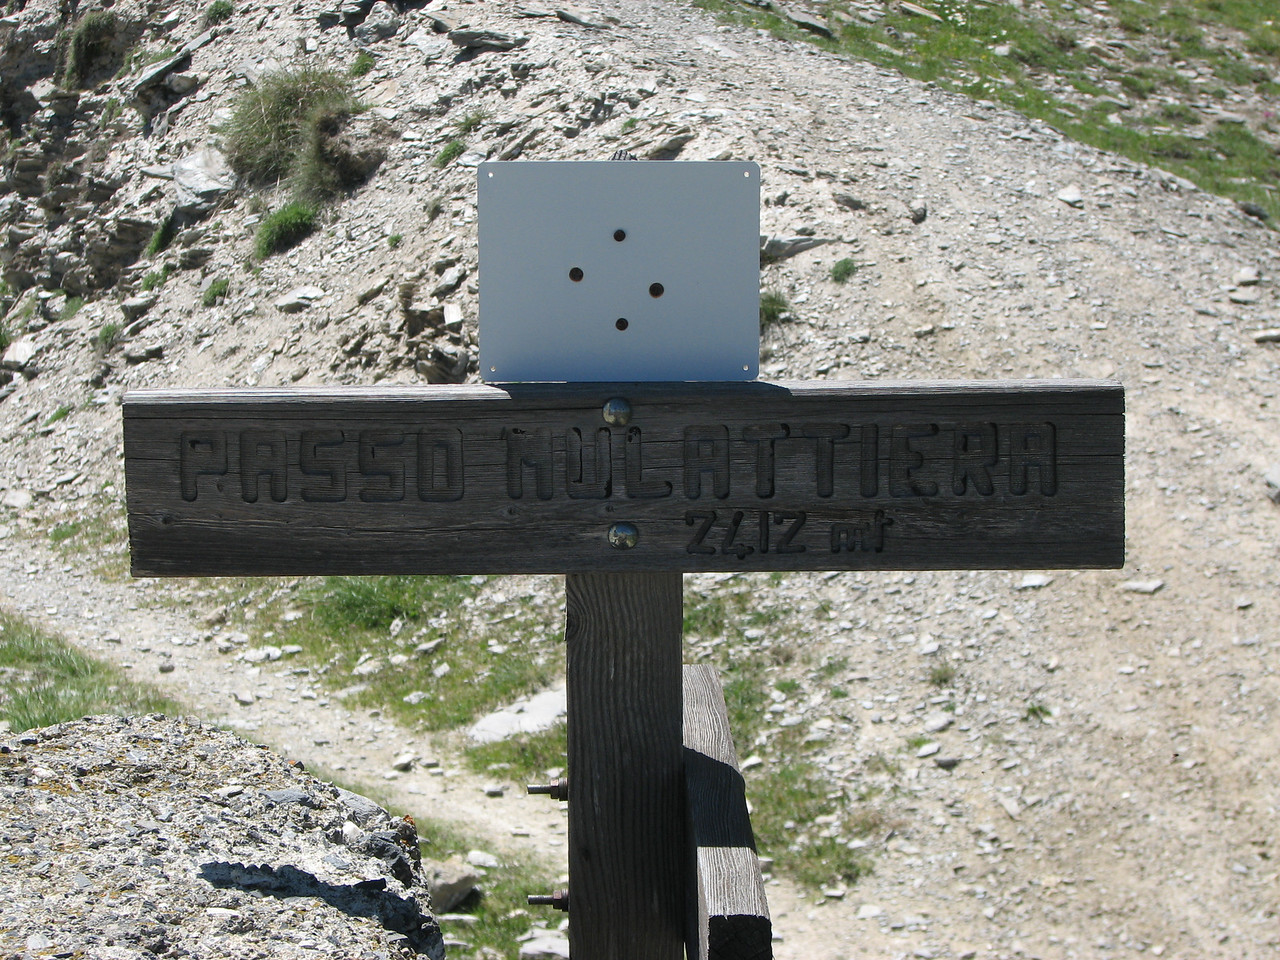 Passo Mulatierra